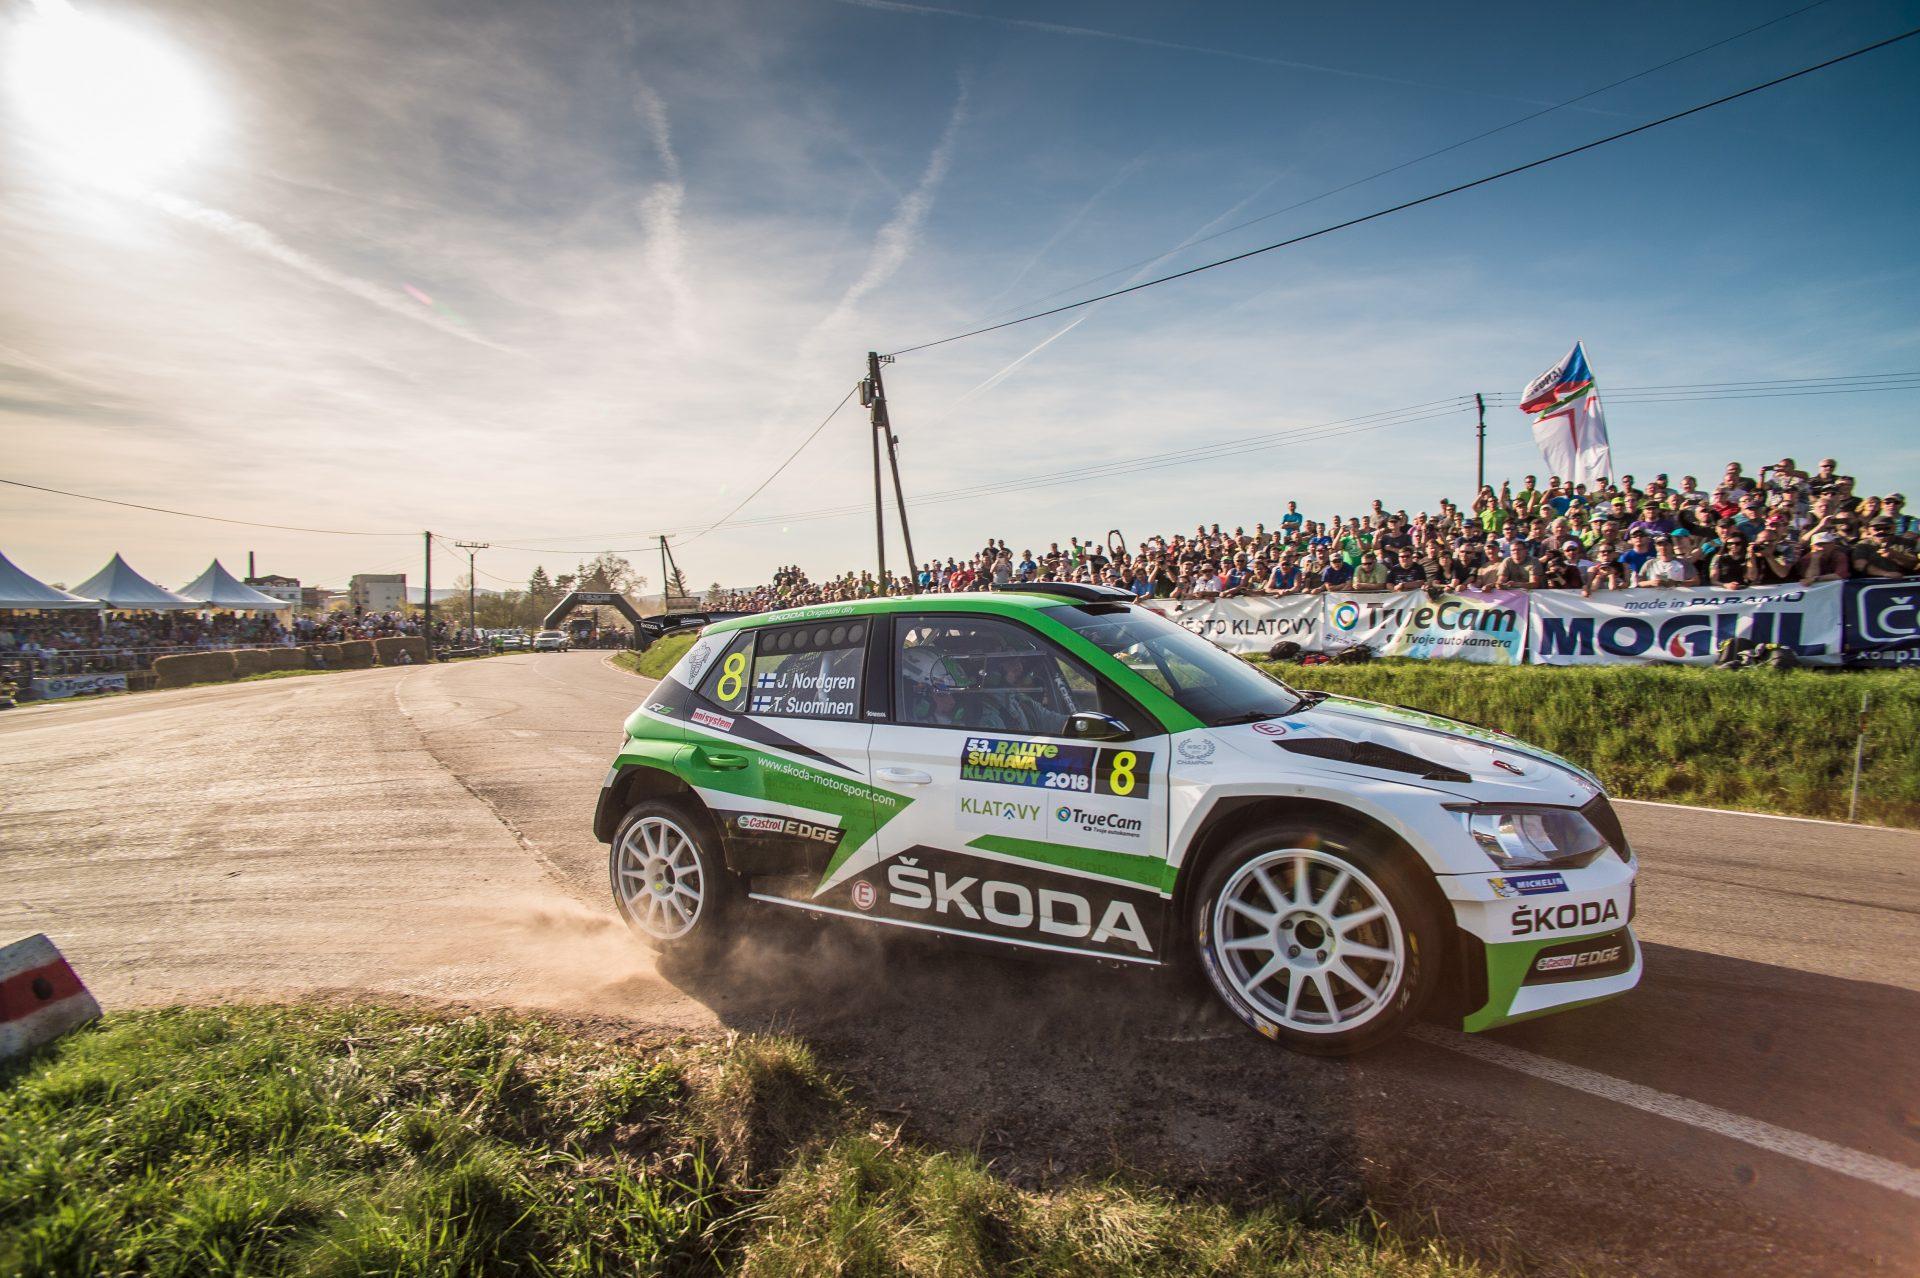 Rally Šumava is On: Both FABIA R5s on the Podium! Kopecký 1st, Nordgren 3rd